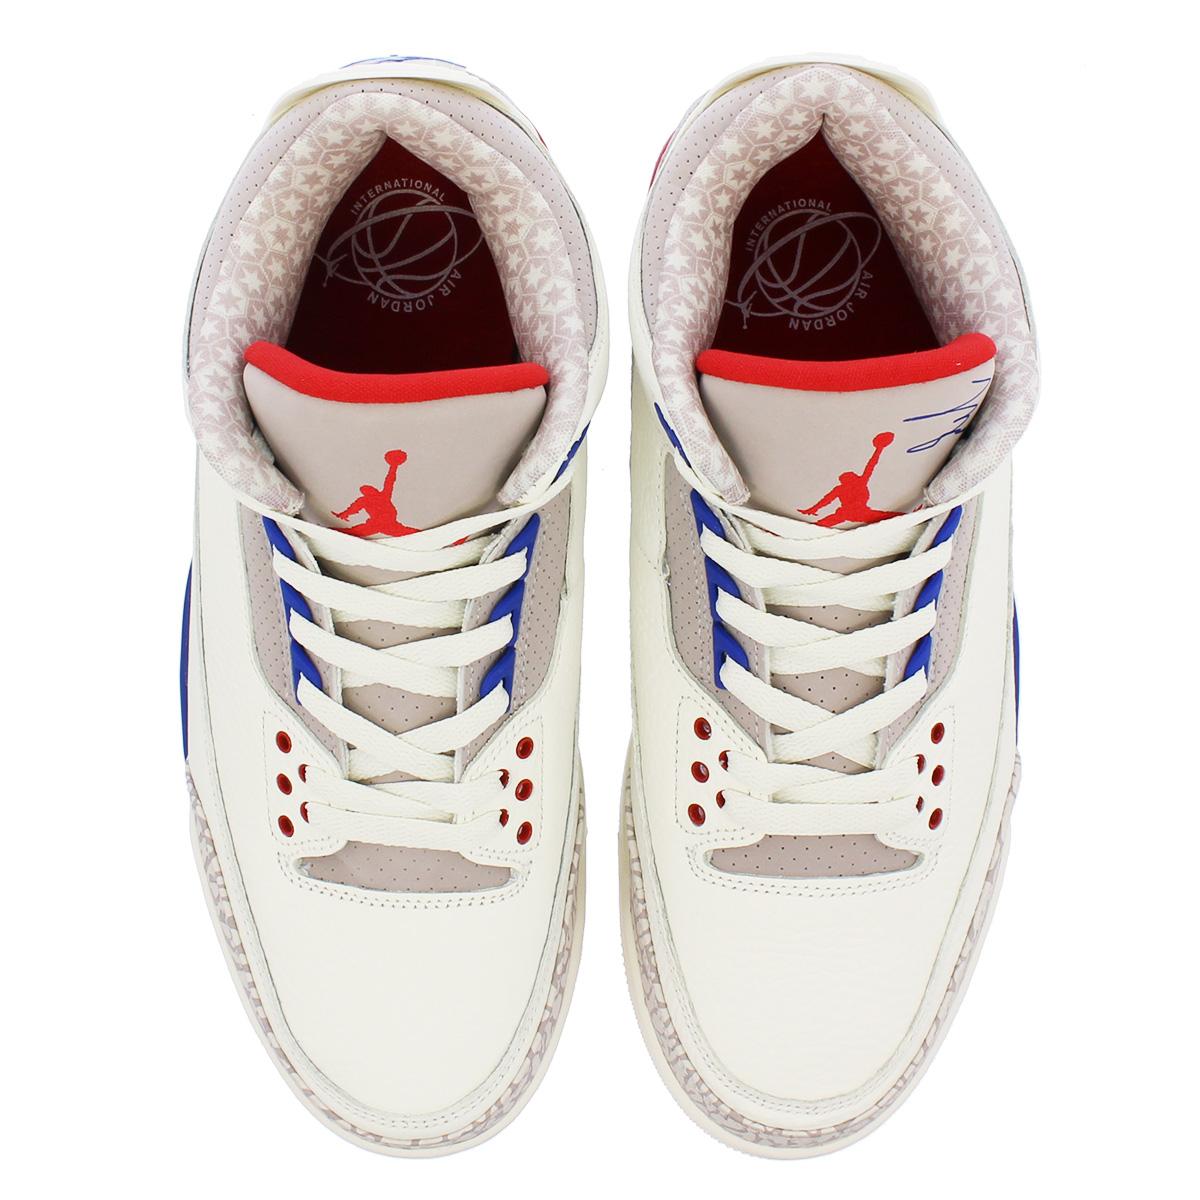 f84fd3a0568e NIKE AIR JORDAN 3 RETRO Nike Air Jordan 3 nostalgic SAIL SPORT ROYAL FIRE  RED 136